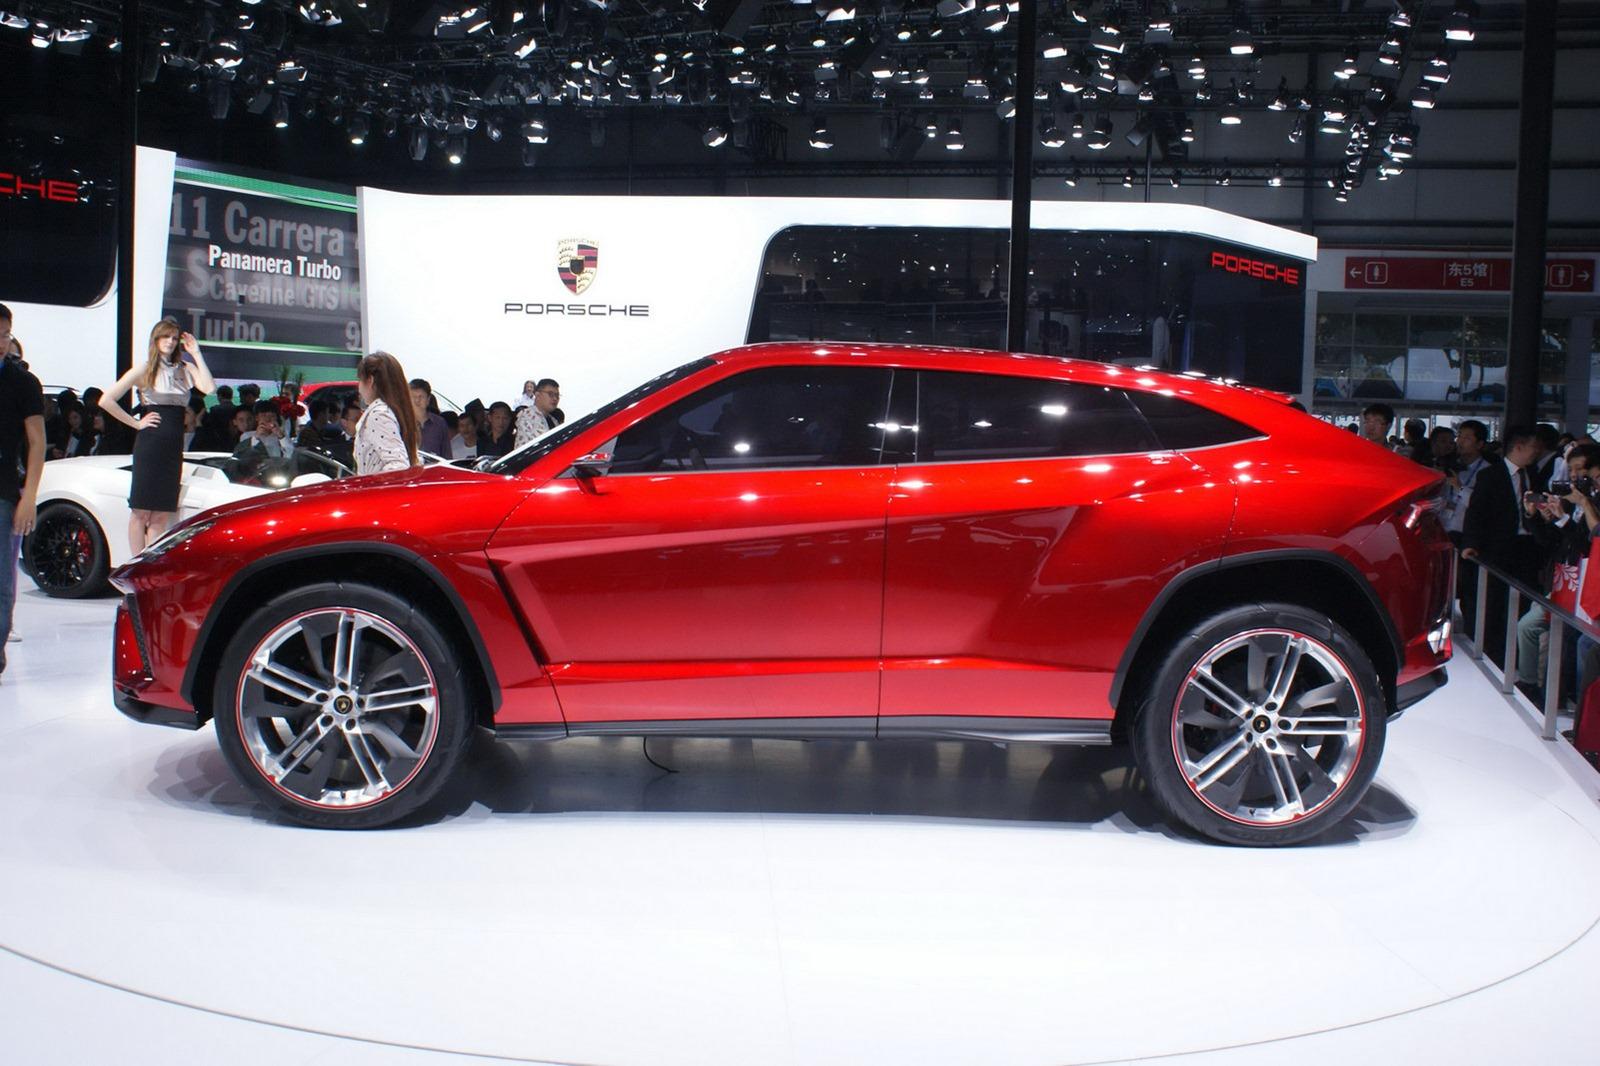 2015 Ford Super Duty Concept